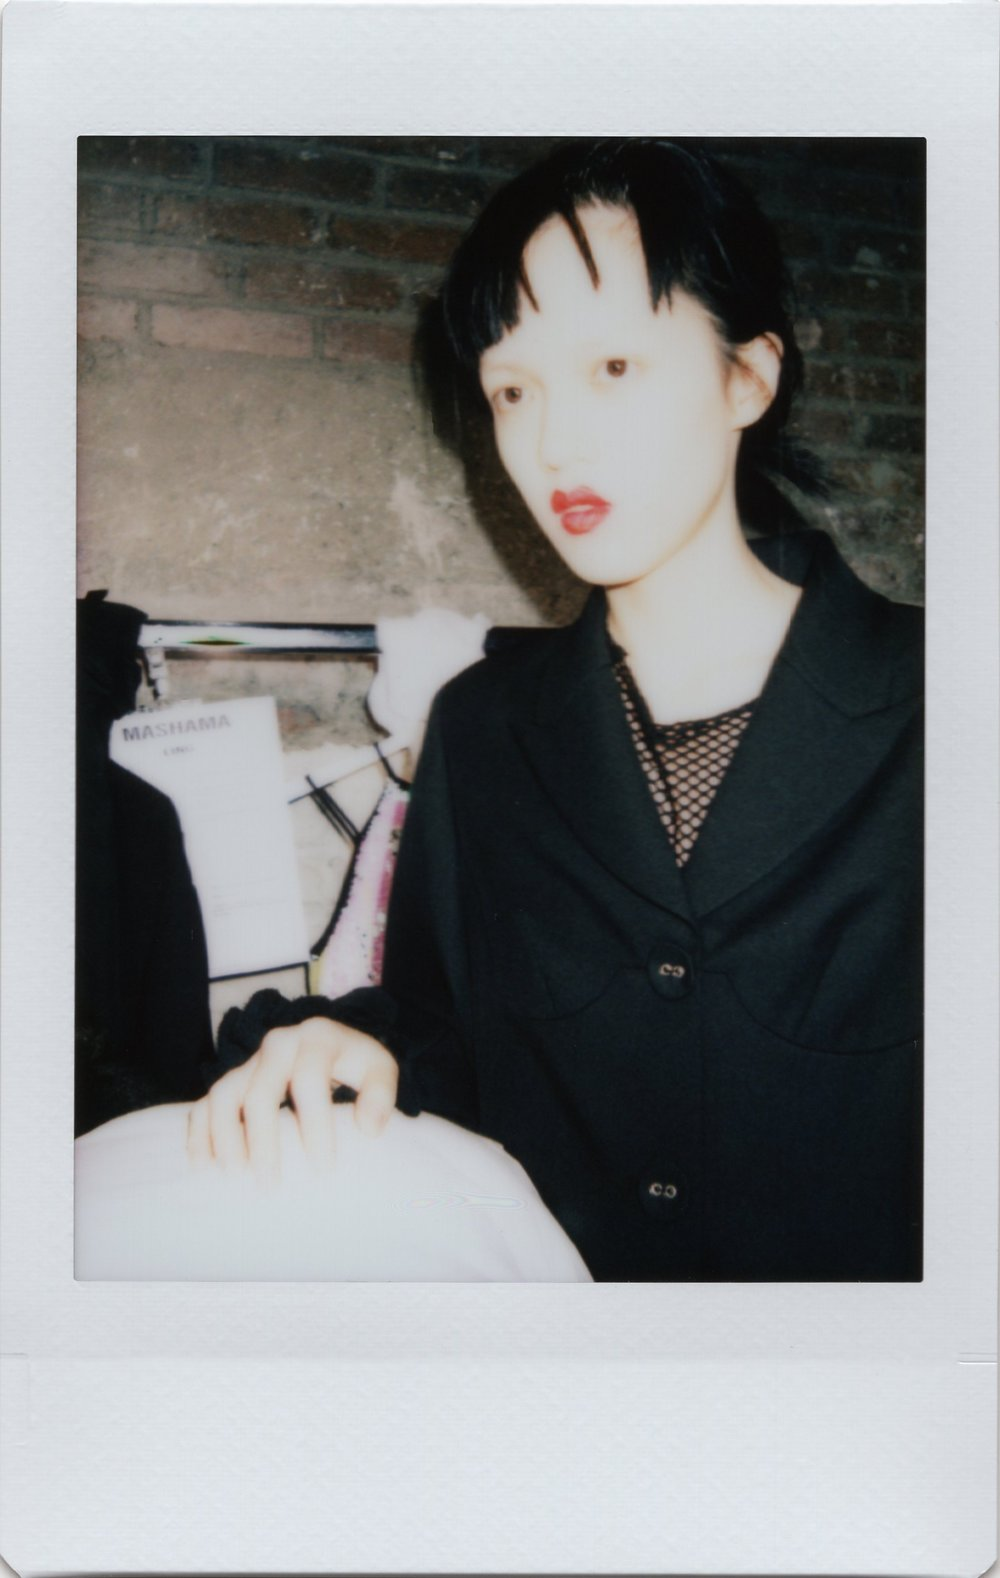 Mashama_Honigschreck_Backstage_Polaroid_2.jpg